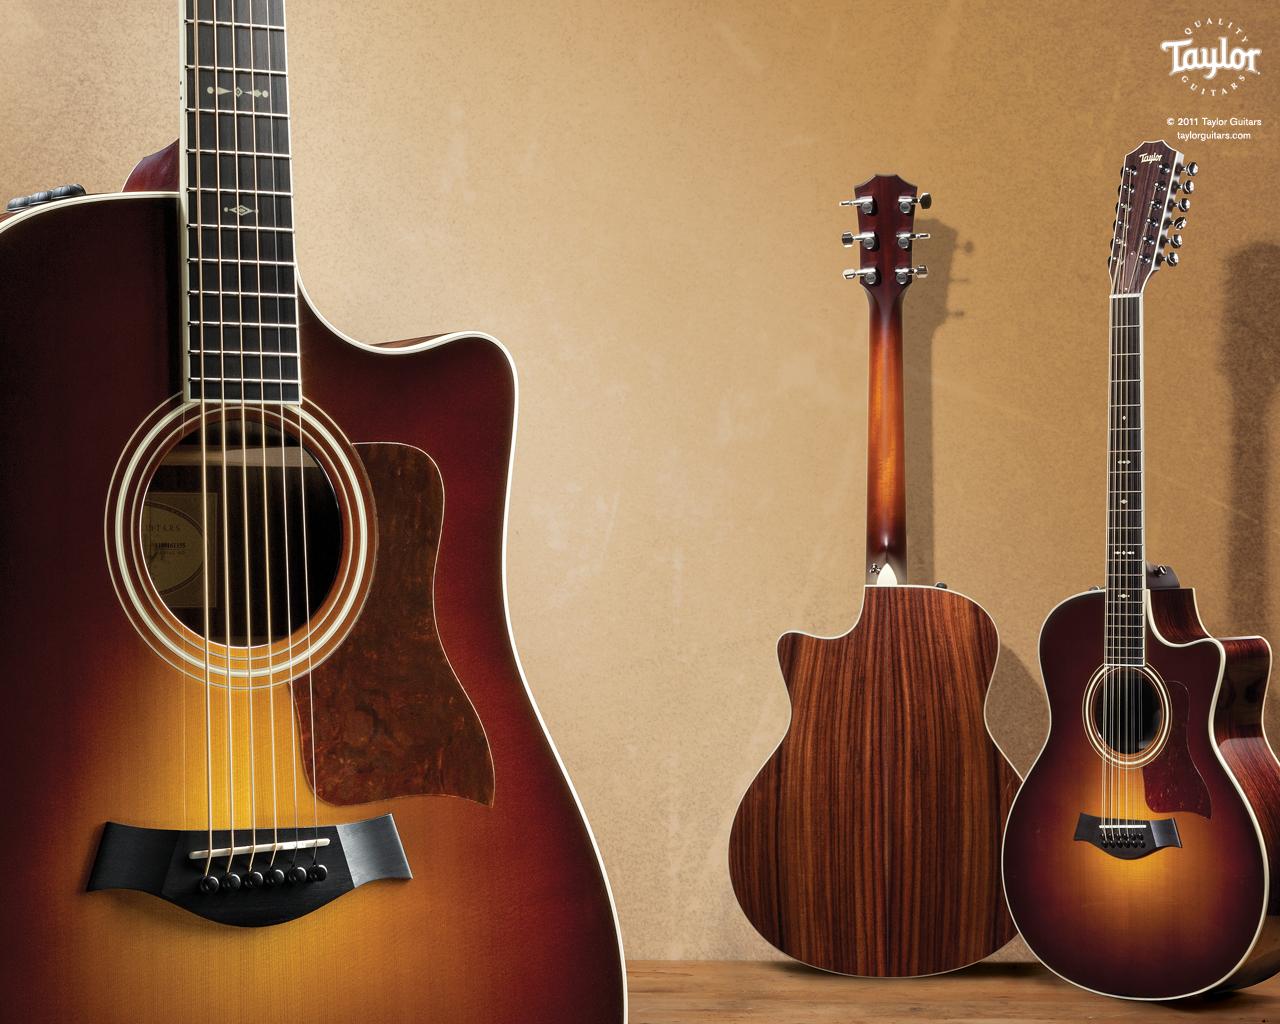 taylor guitars taylor guitars wallpapers